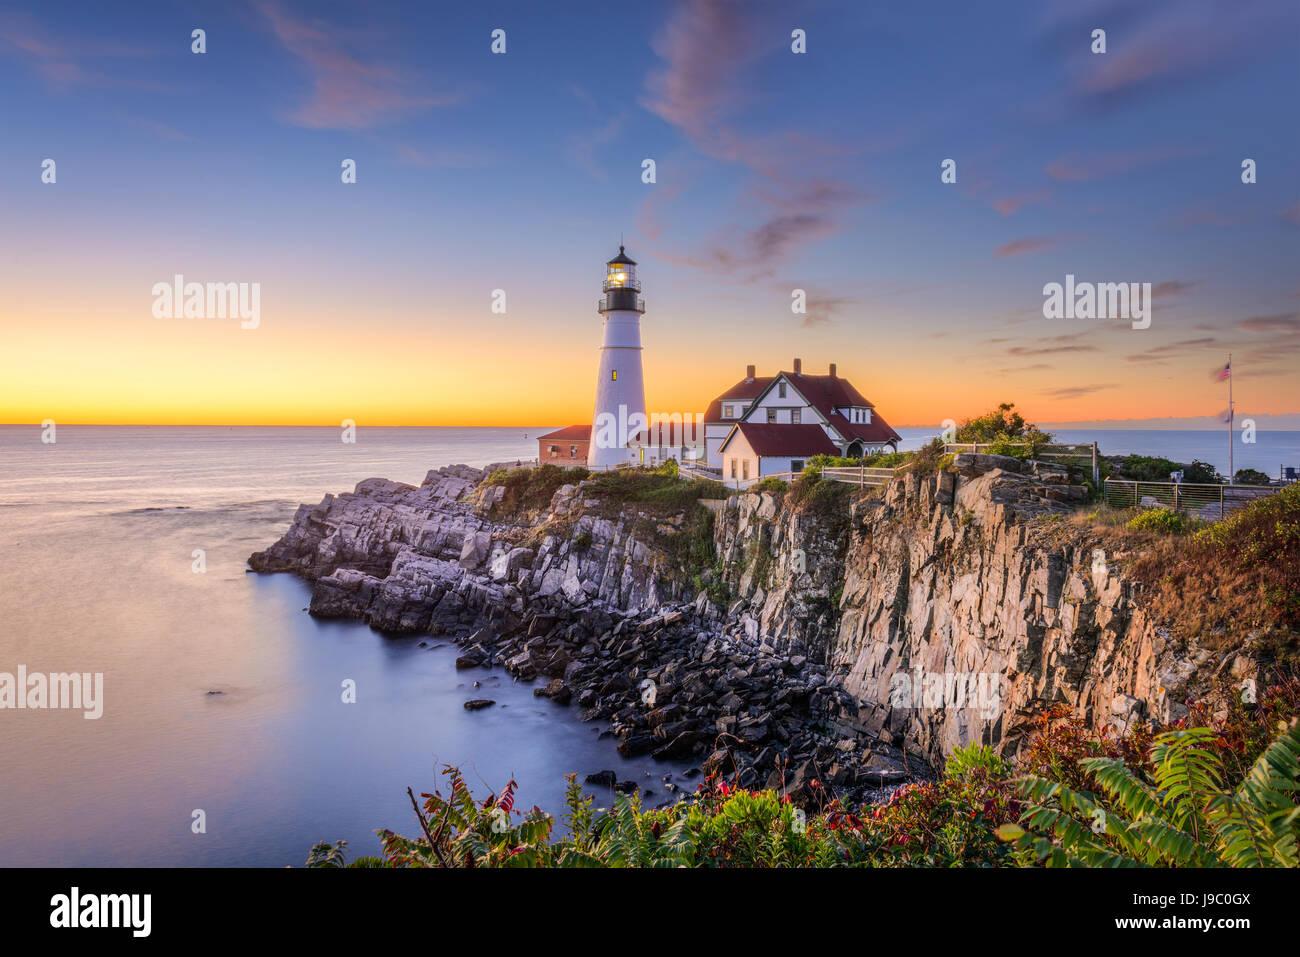 Portland, Maine, EE.UU. en Portland Head Light. Imagen De Stock